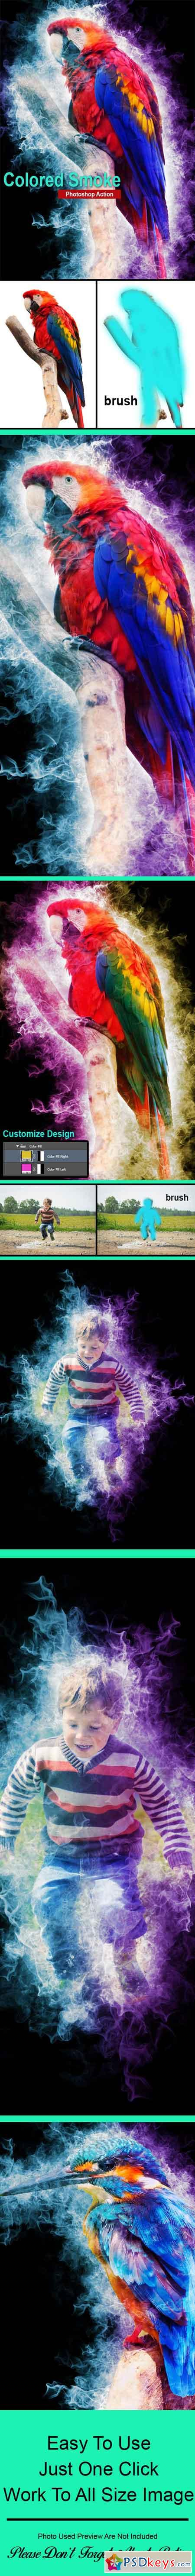 Colored Smoke Photoshop Action 23106077